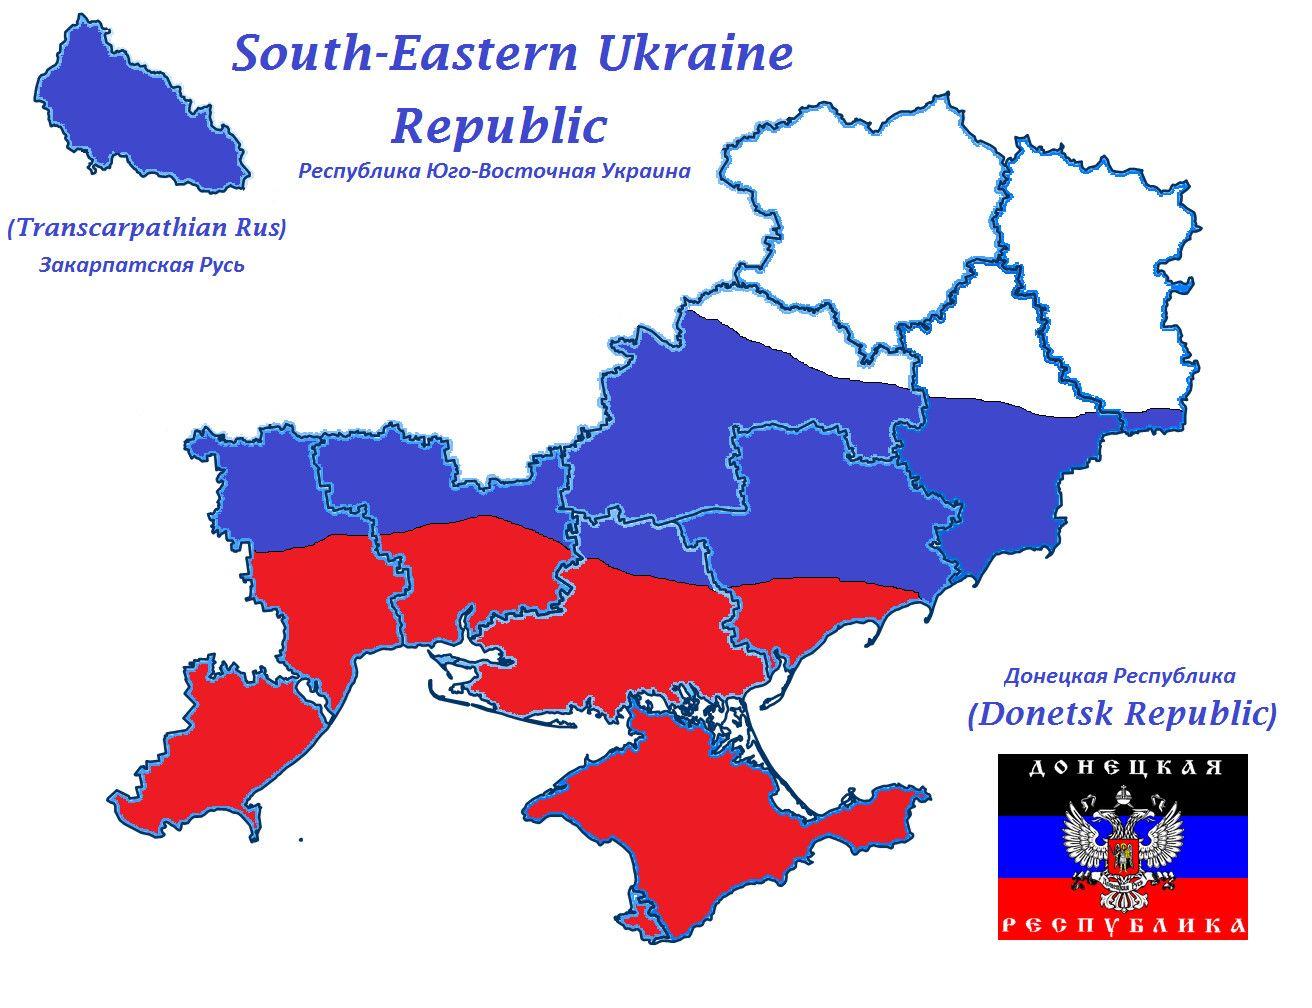 SouthEastern Ukraine future map Novorossiya  The Future